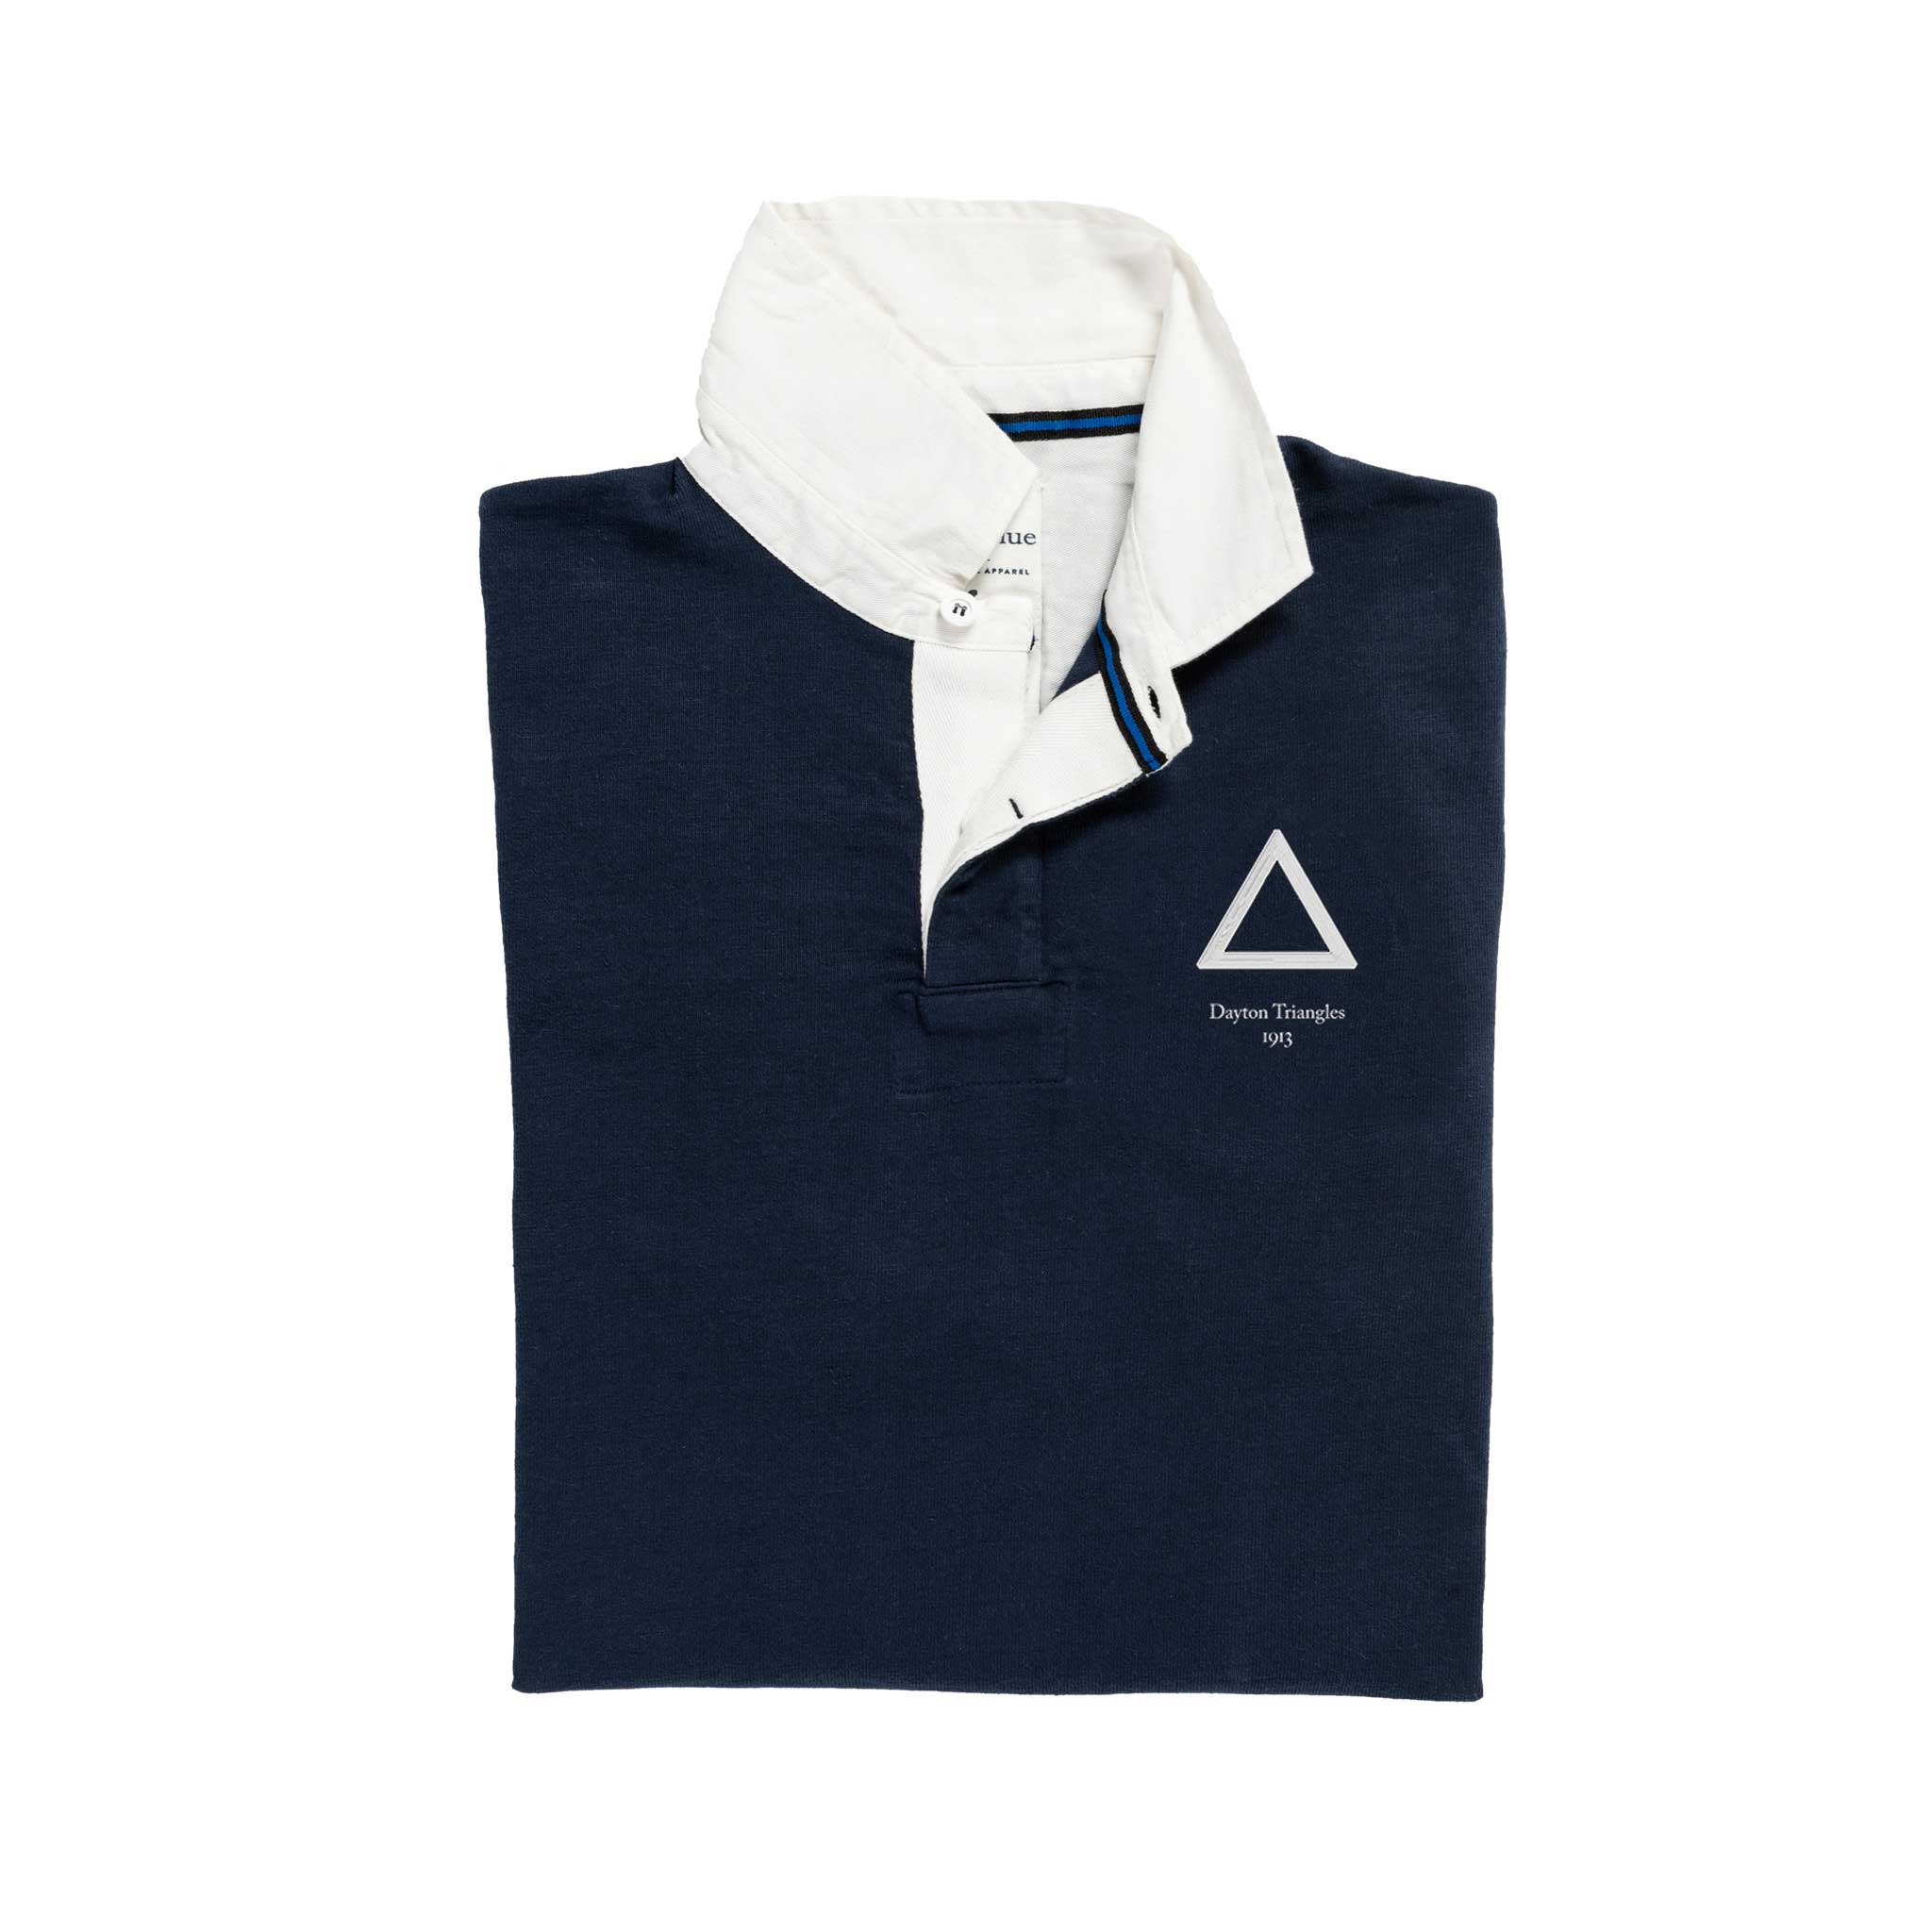 Dayton Triangles Rugby Shirt_Folded